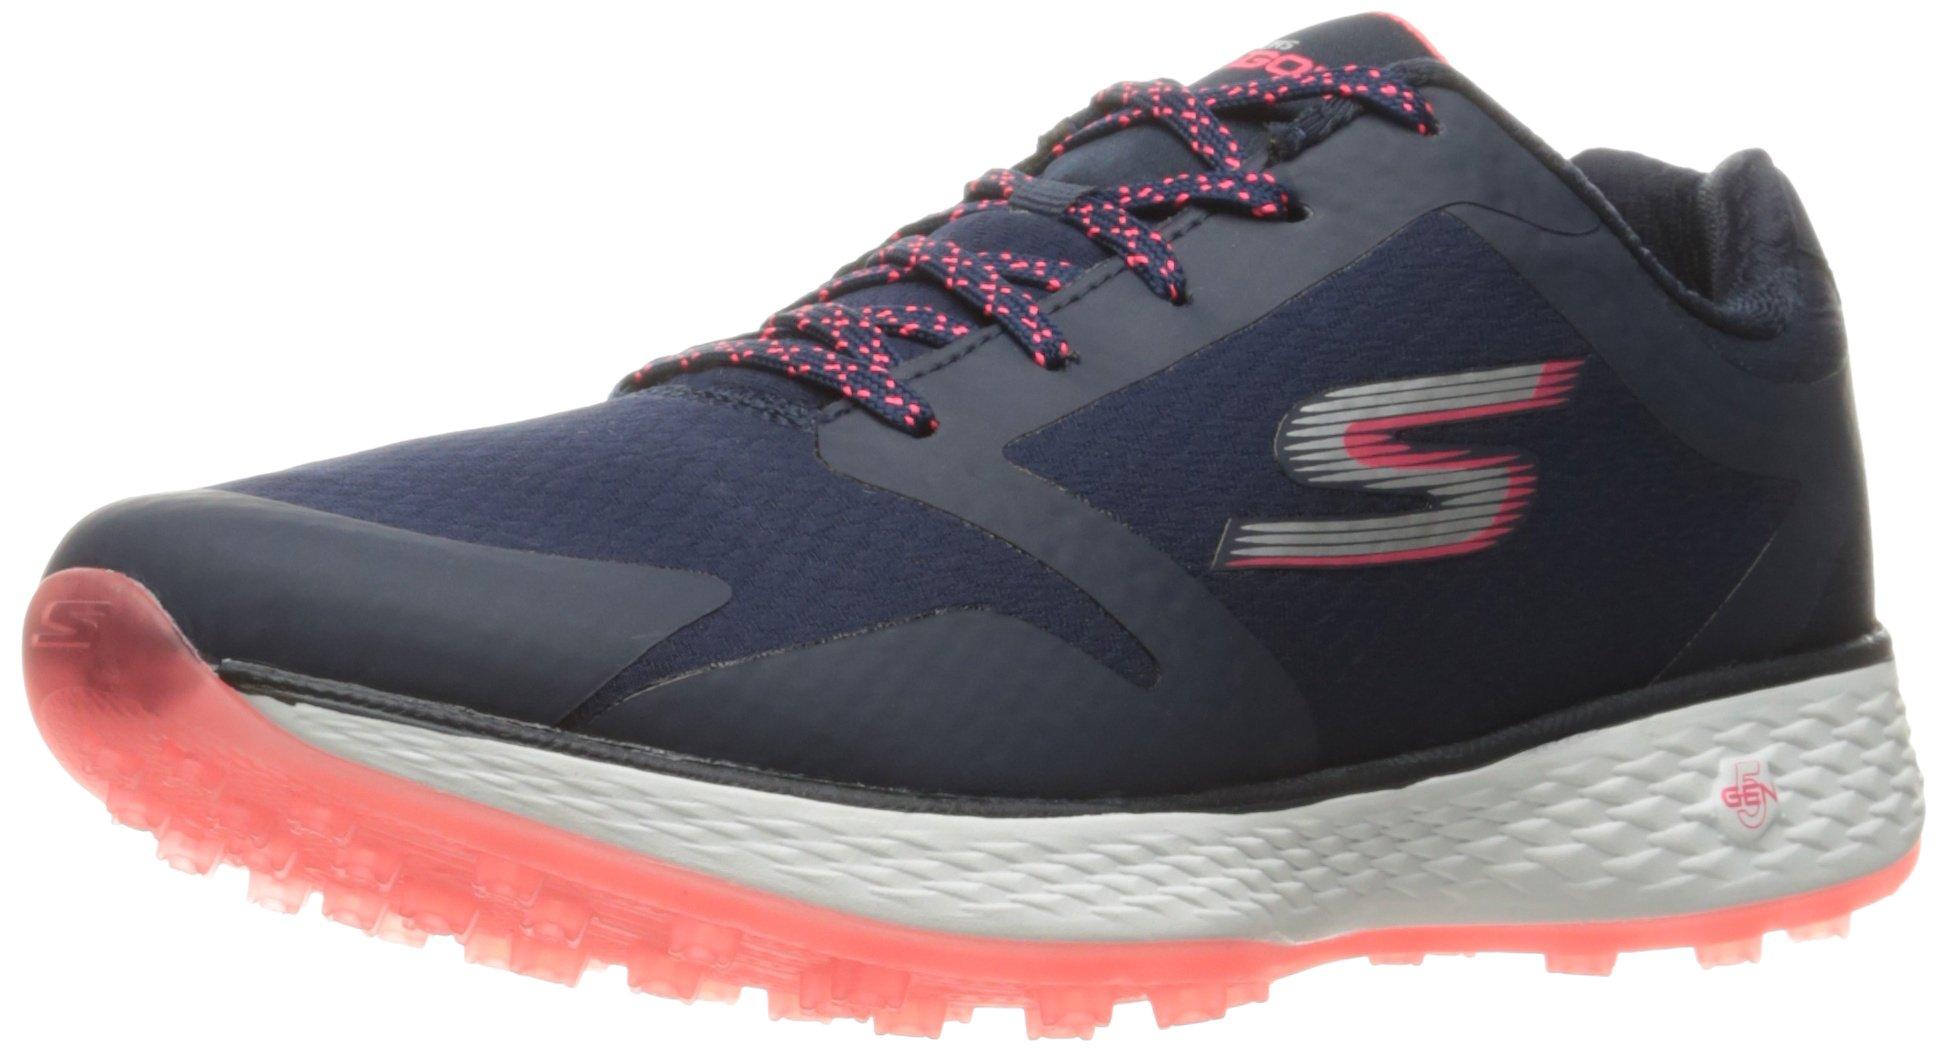 Skechers Performance Women's Go Golf Birdie Golf Shoe,Pink/Navy,7.5 M US